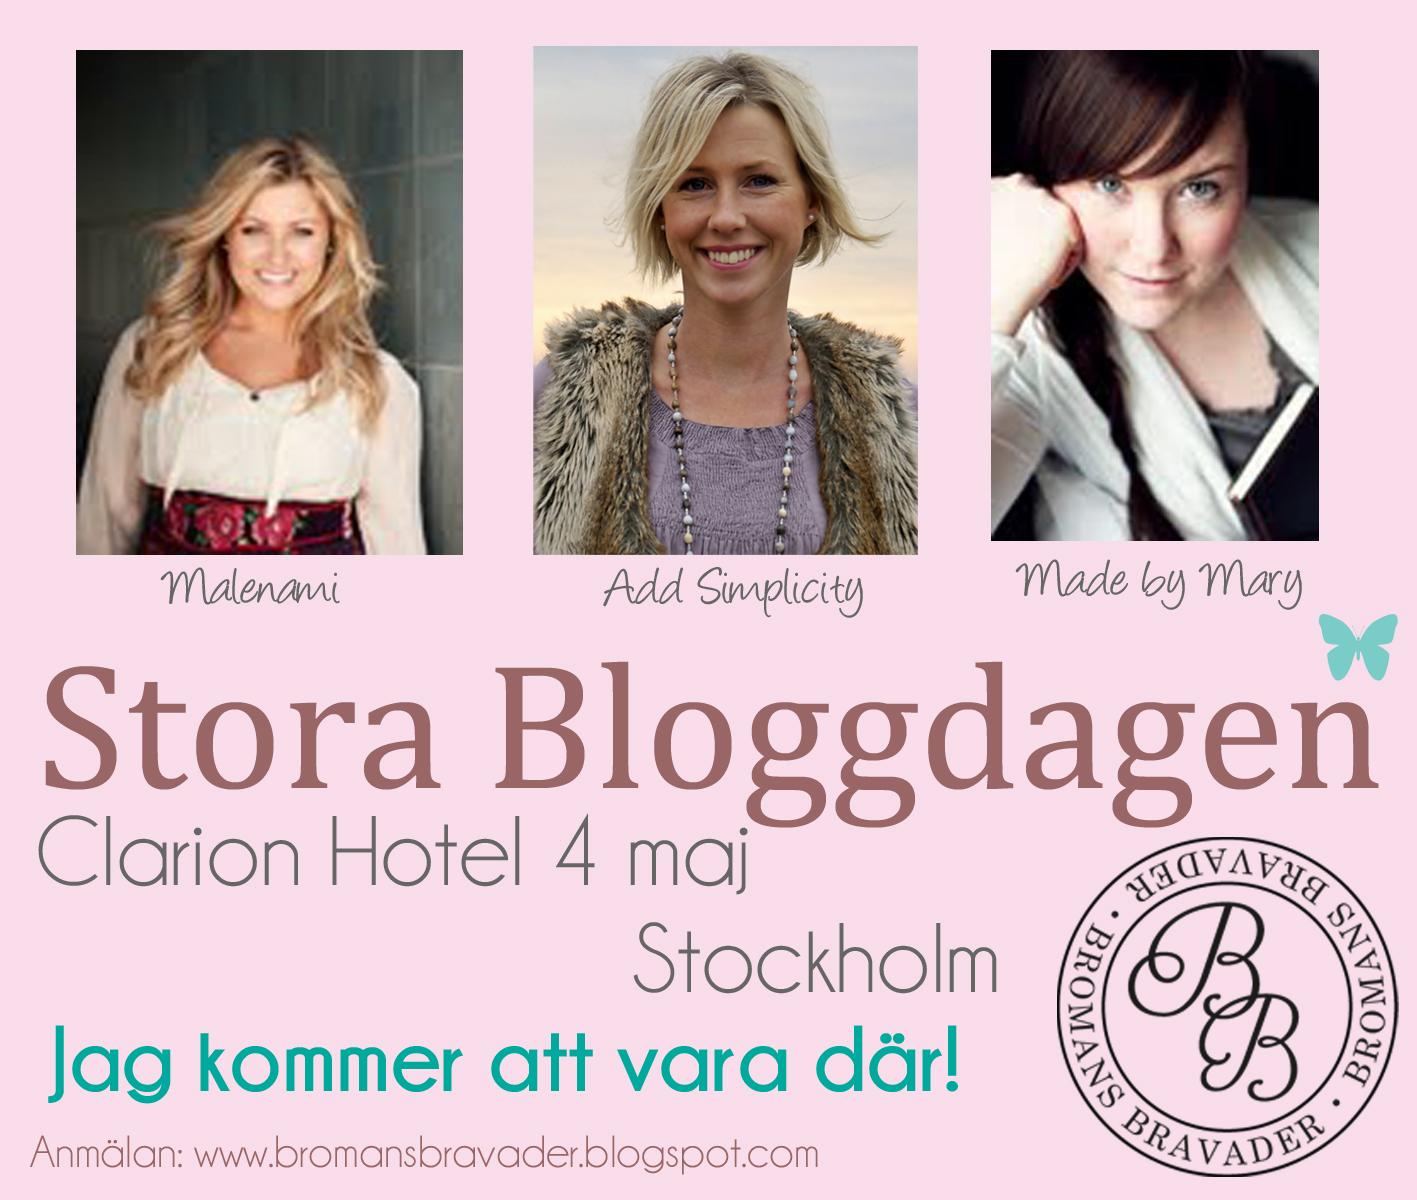 Stora Bloggdagen